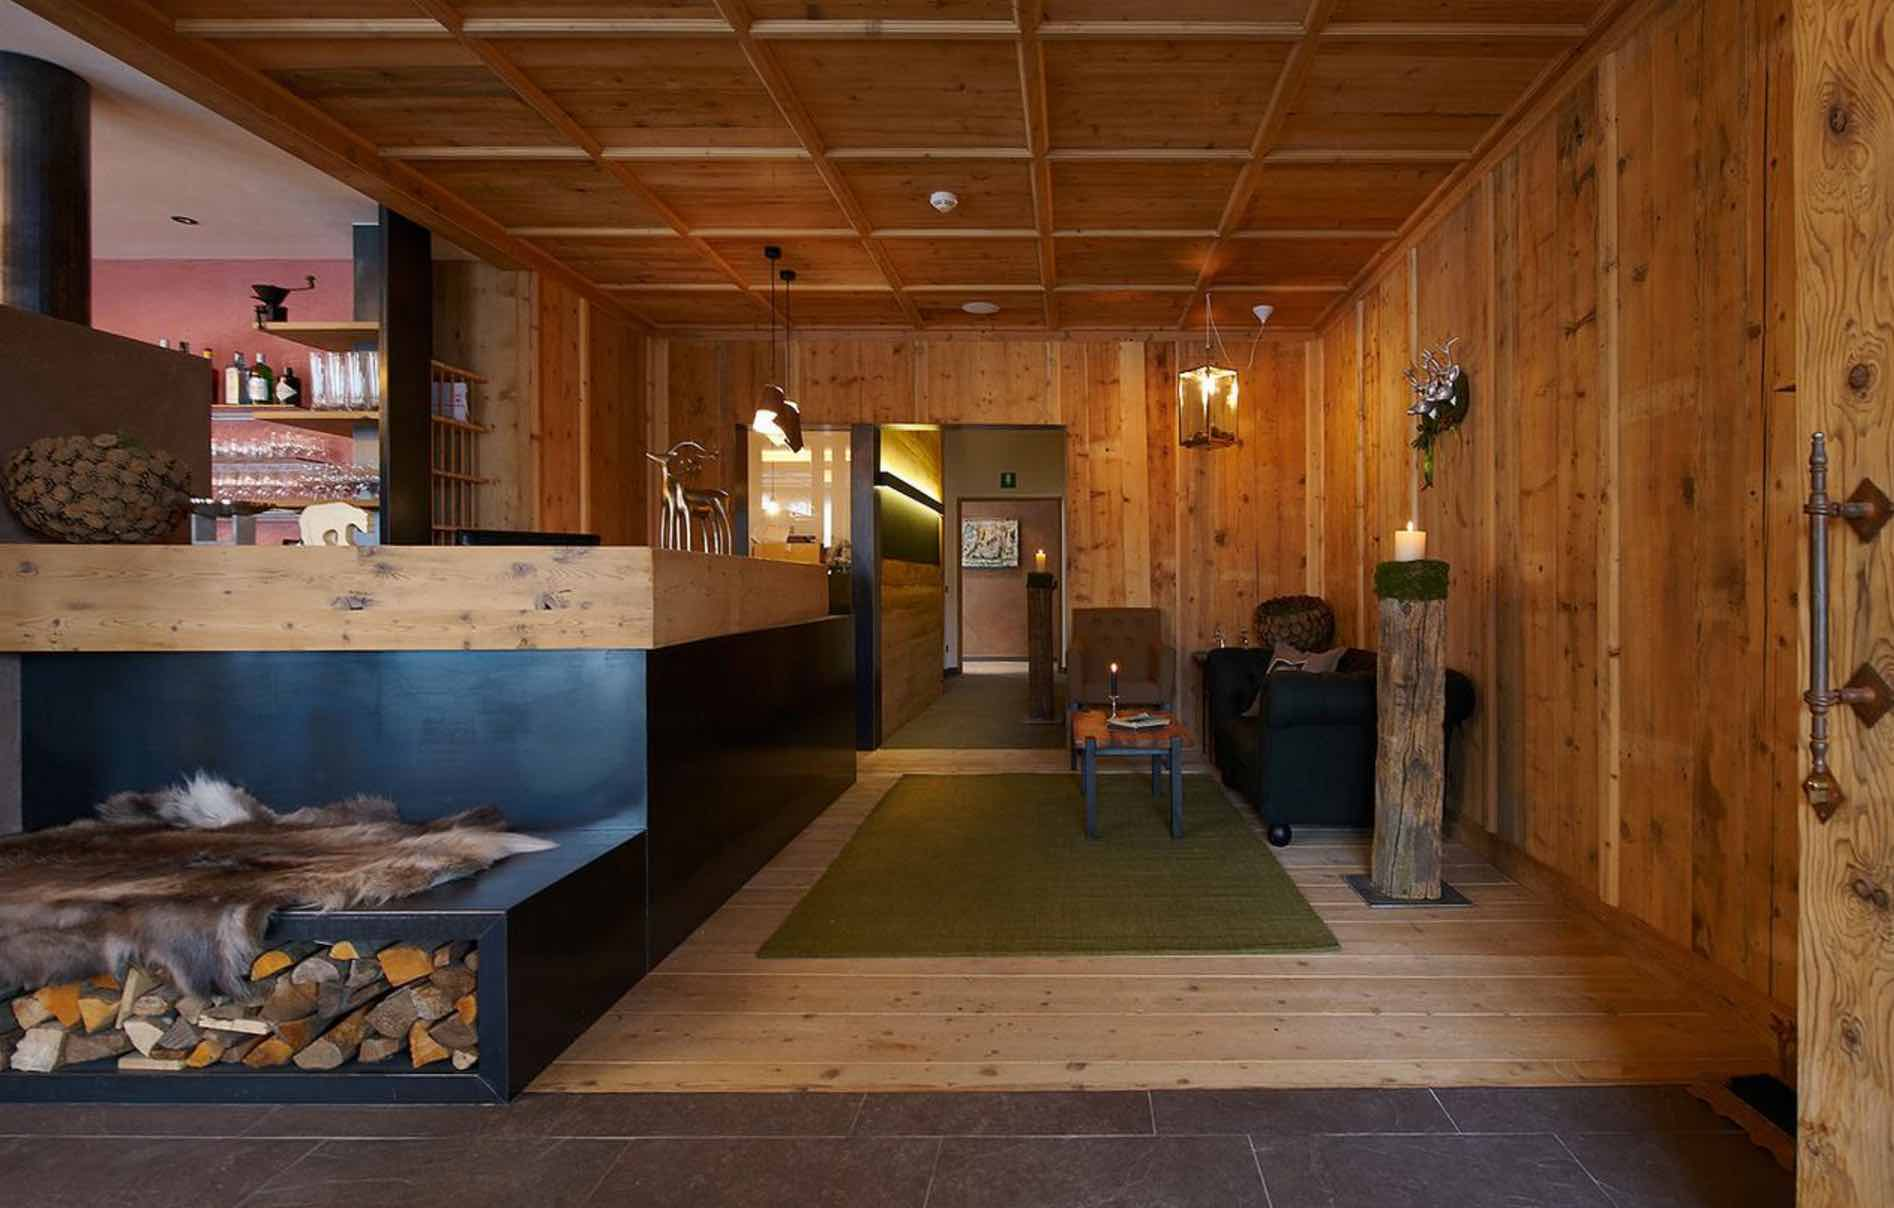 Lagació Mountain Residence - Hotels Dolomites Italy 2.jpg